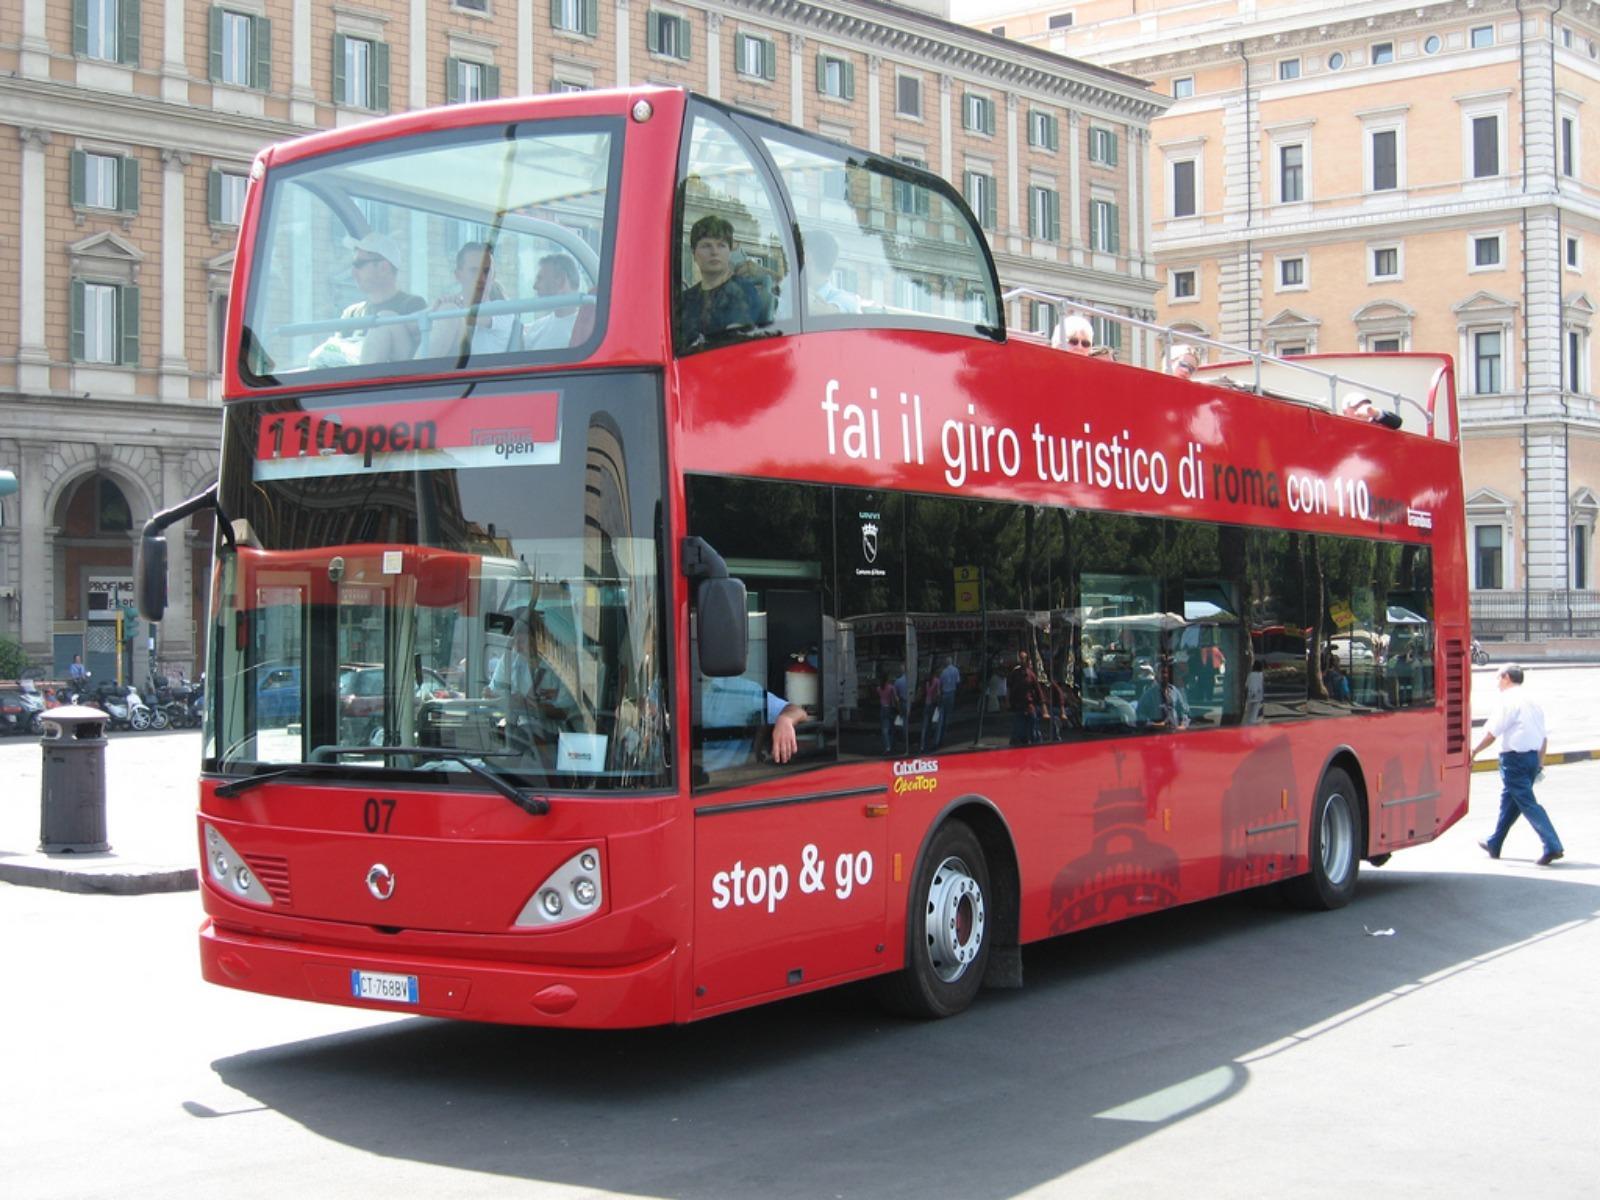 roma23-1613660806.jpg